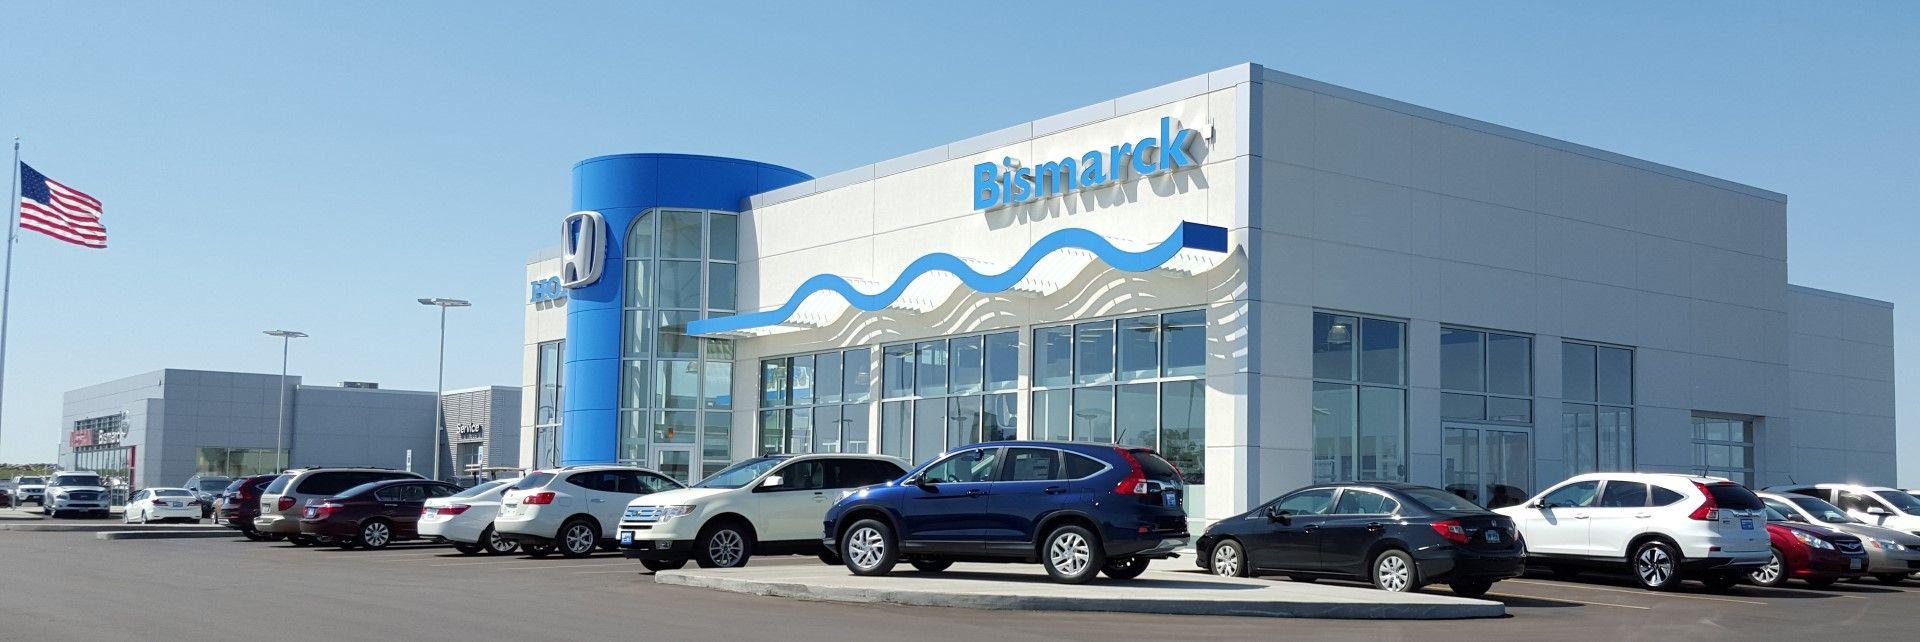 Bismarck Motor Company (With images) Precast concrete